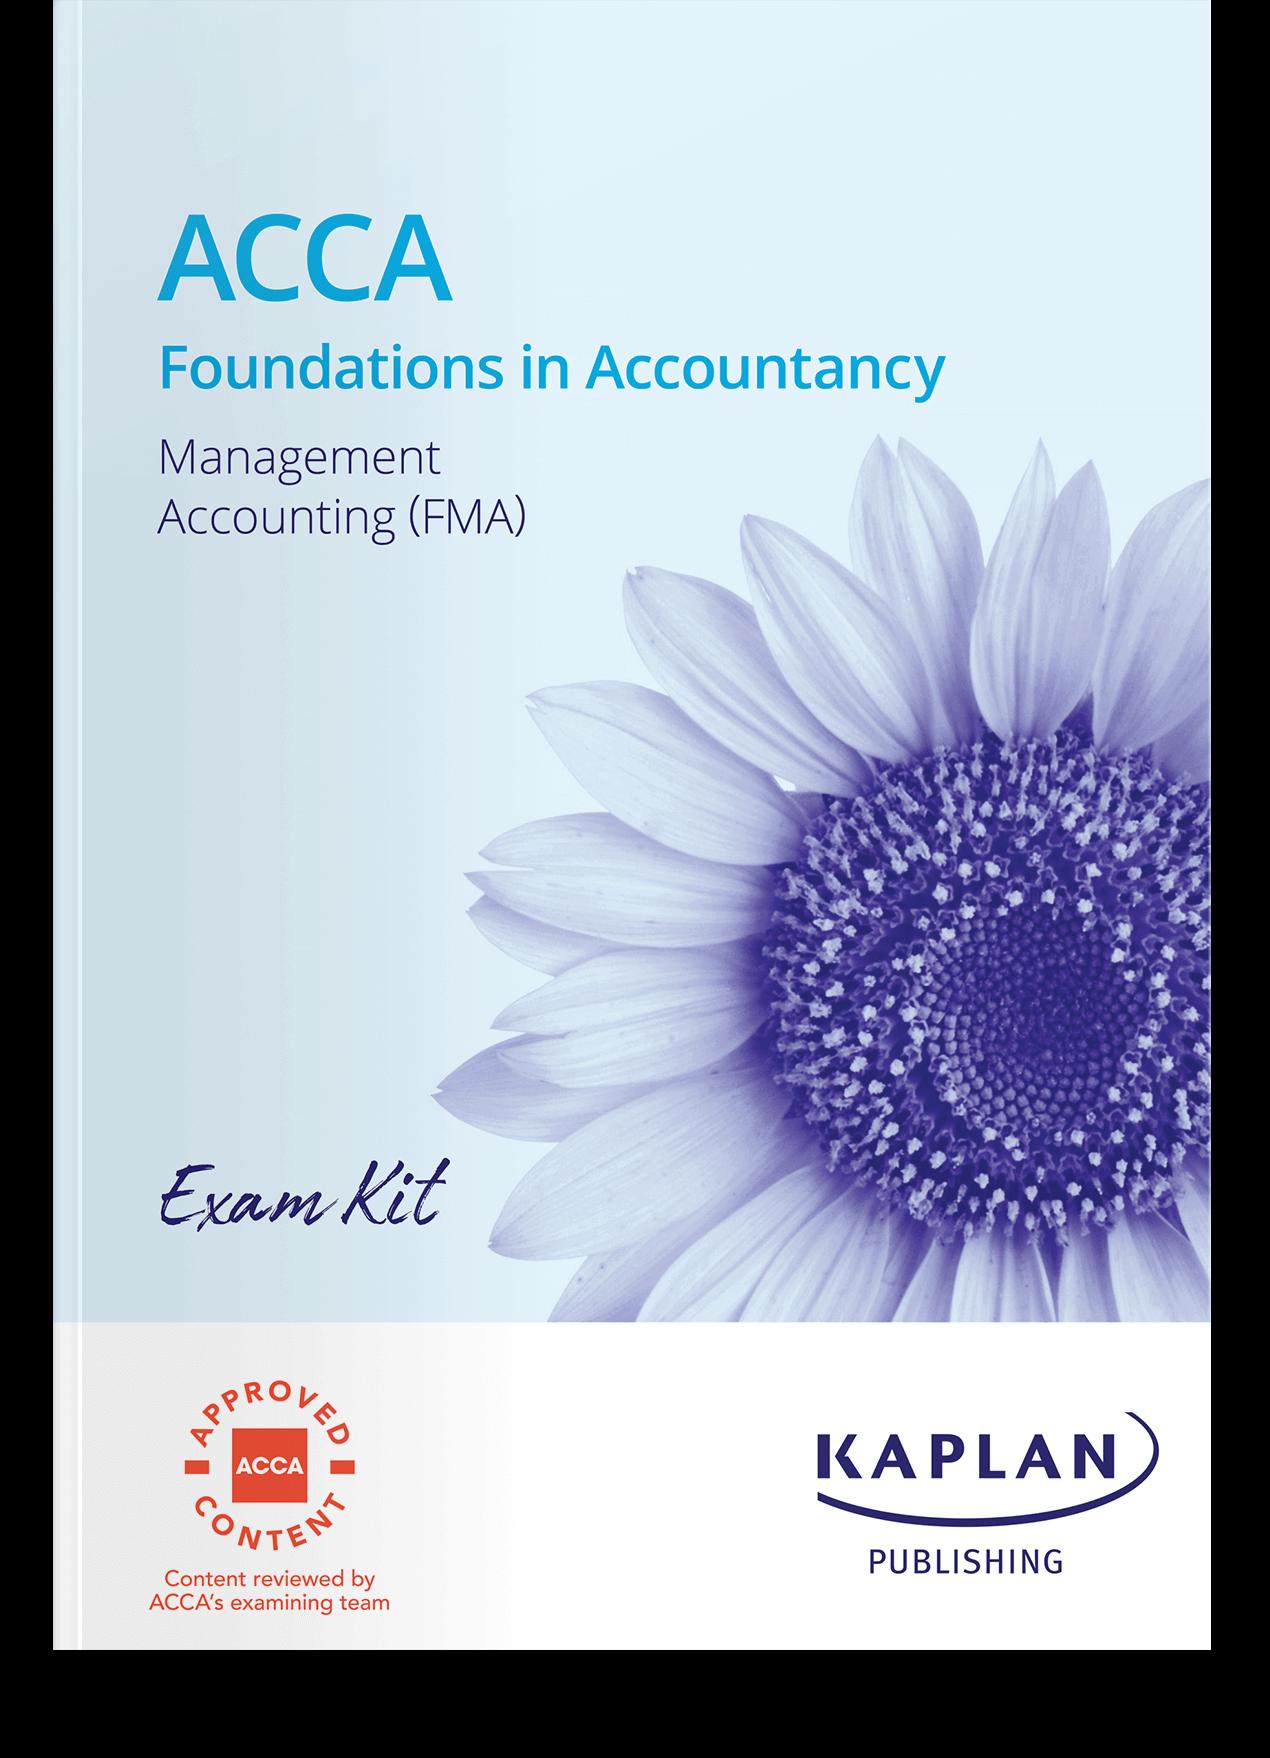 FIA - Management Accounting (FMA) - Exam Kit